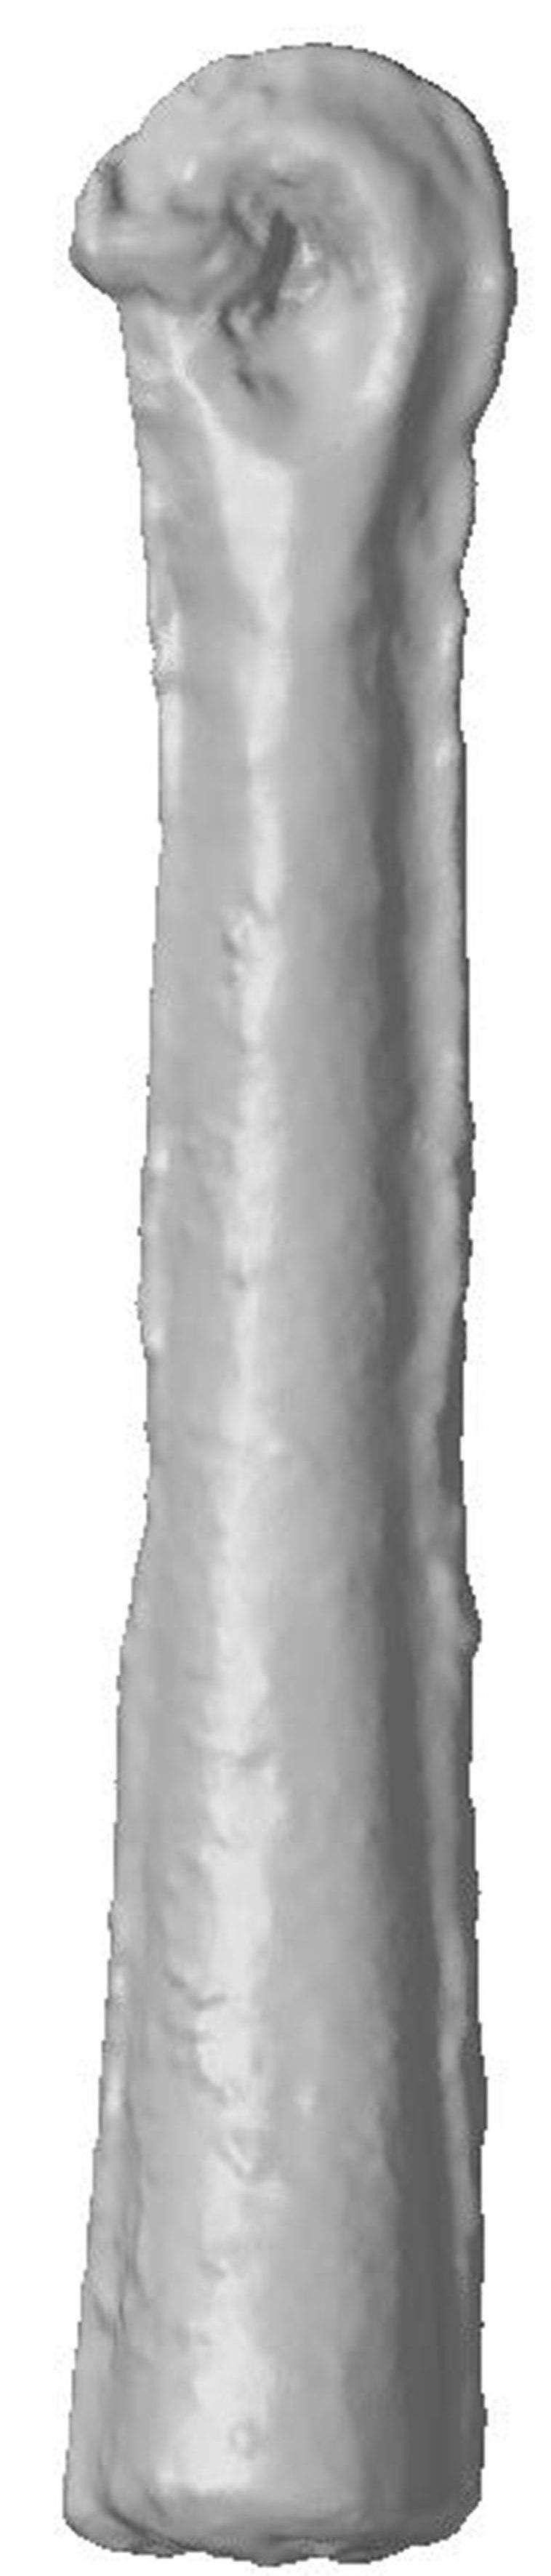 淡路島銅鐸、朝鮮半島の鉛使用か 成分分析で判明 _b0064113_09012959.jpg